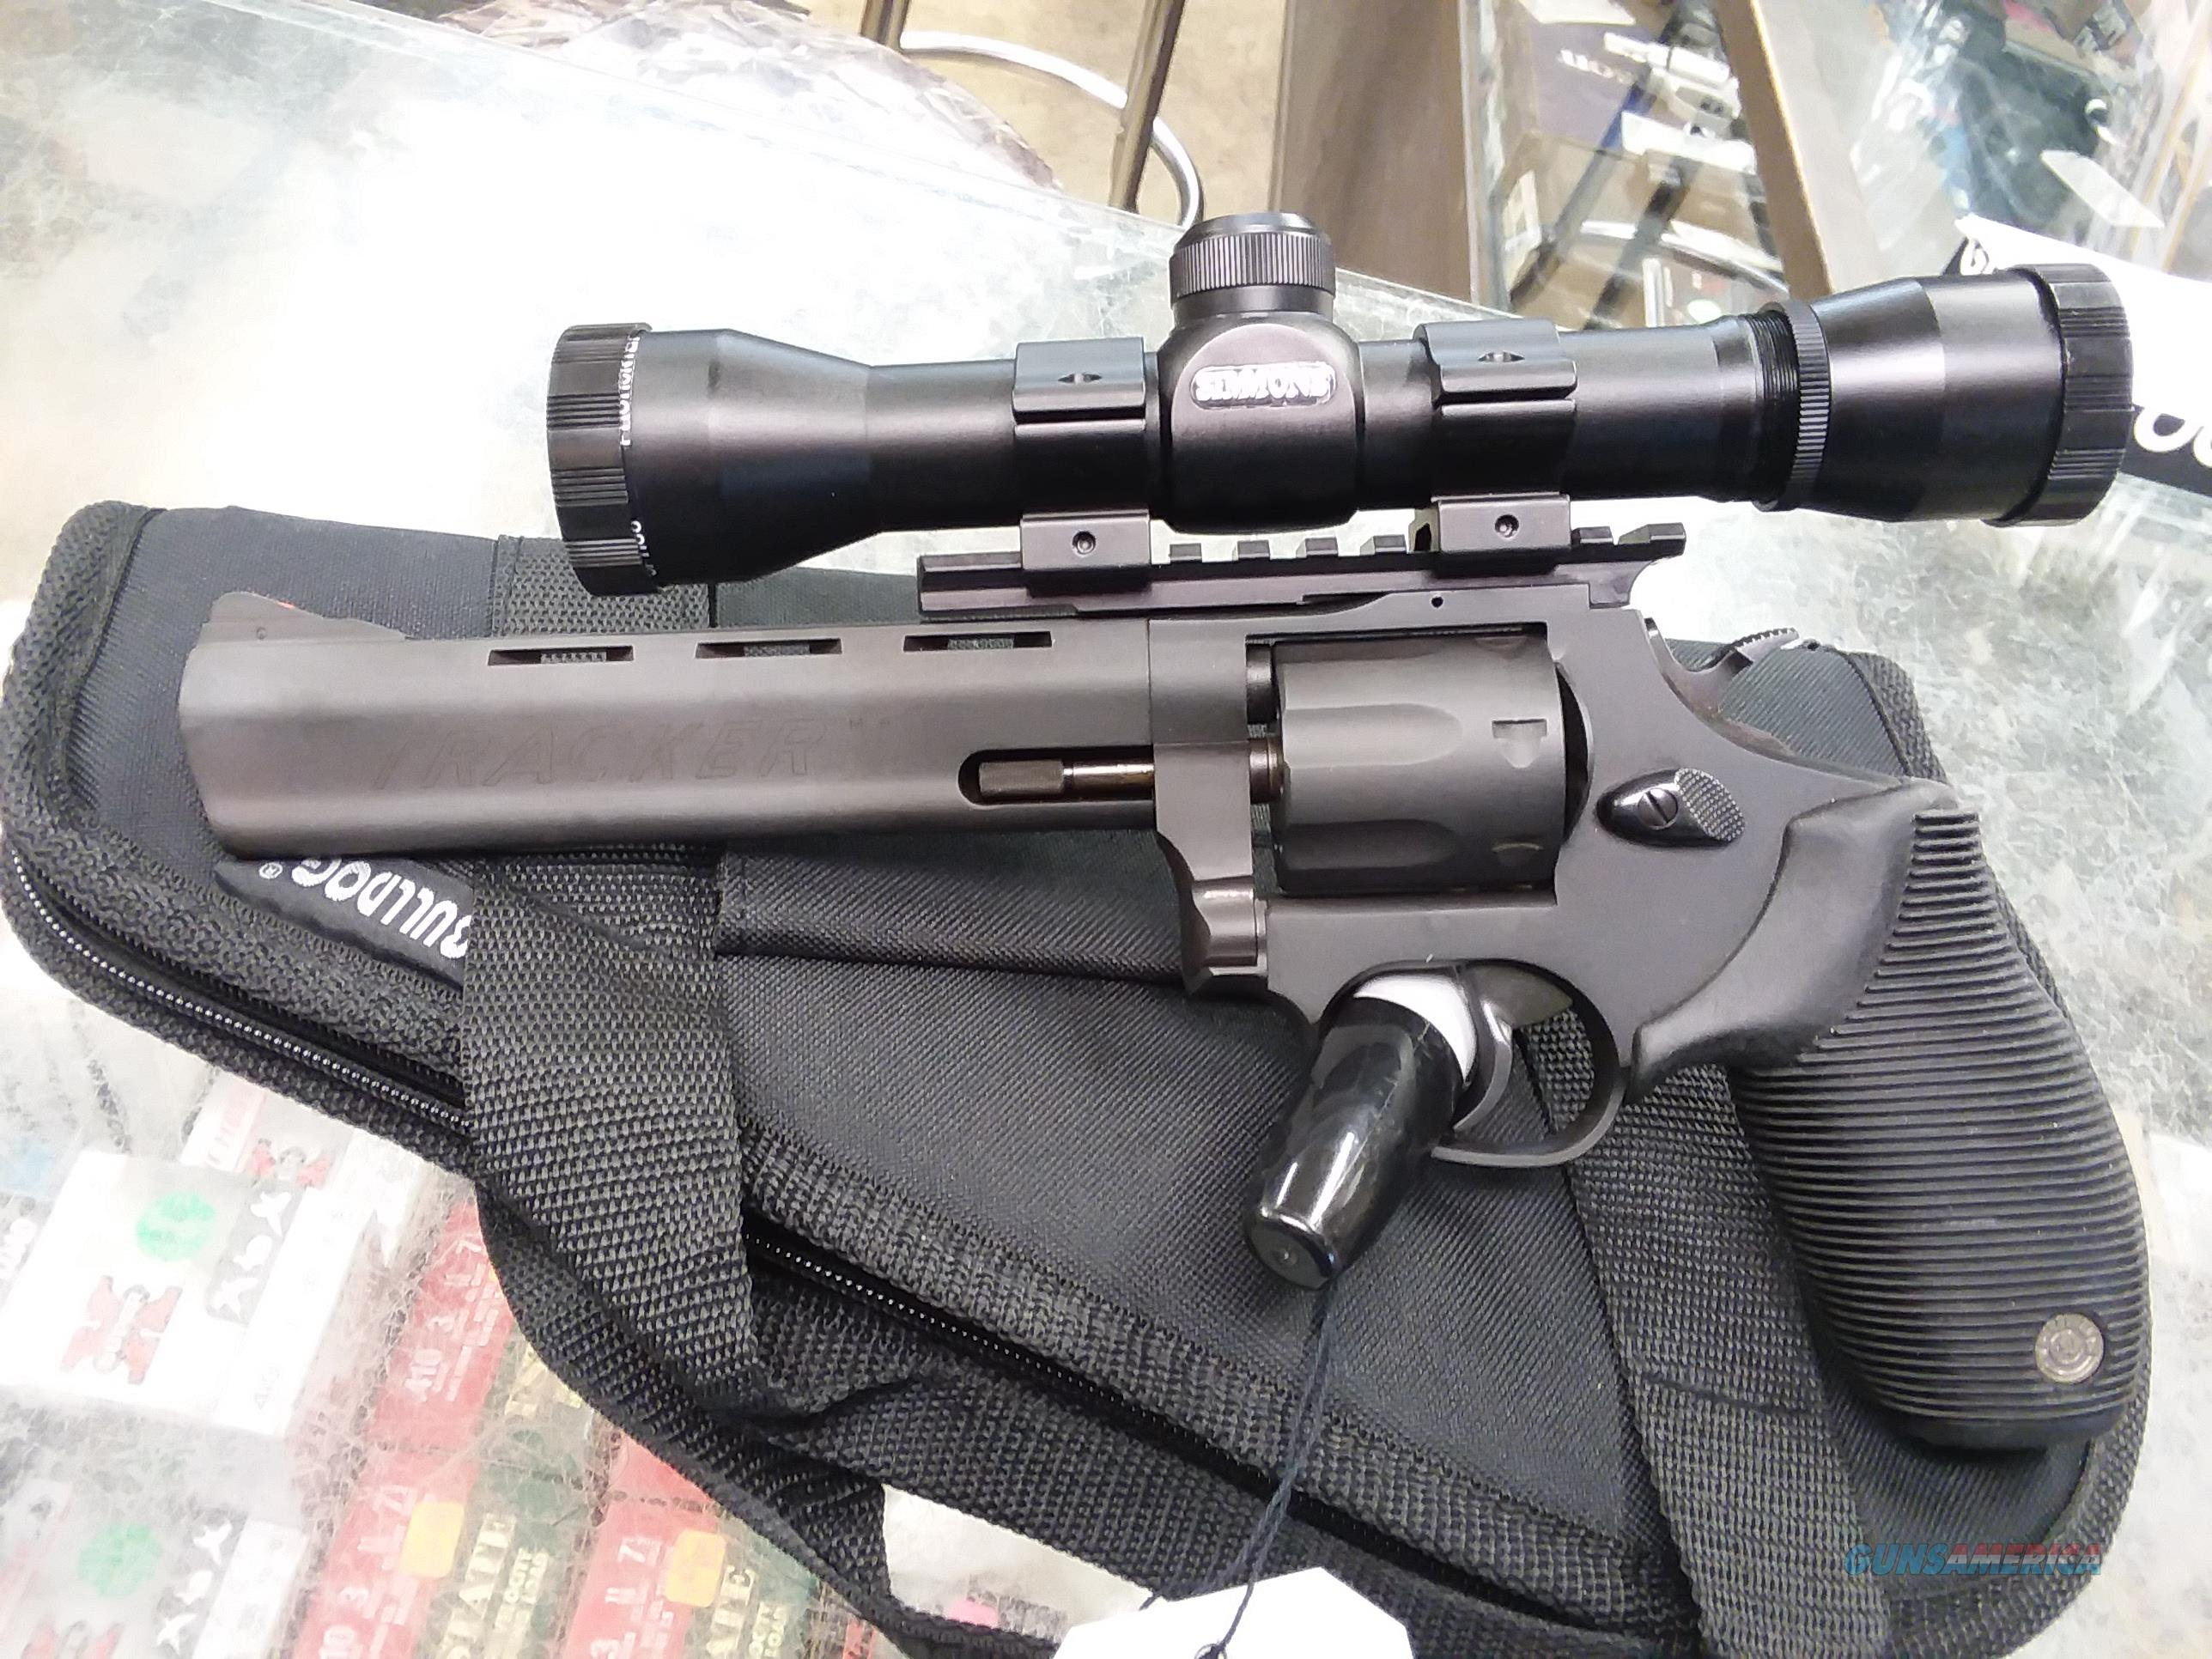 TAURUS MODEL 2170061 TRACKER 17HMR REVOLVER  Guns > Pistols > Taurus Pistols > Revolvers